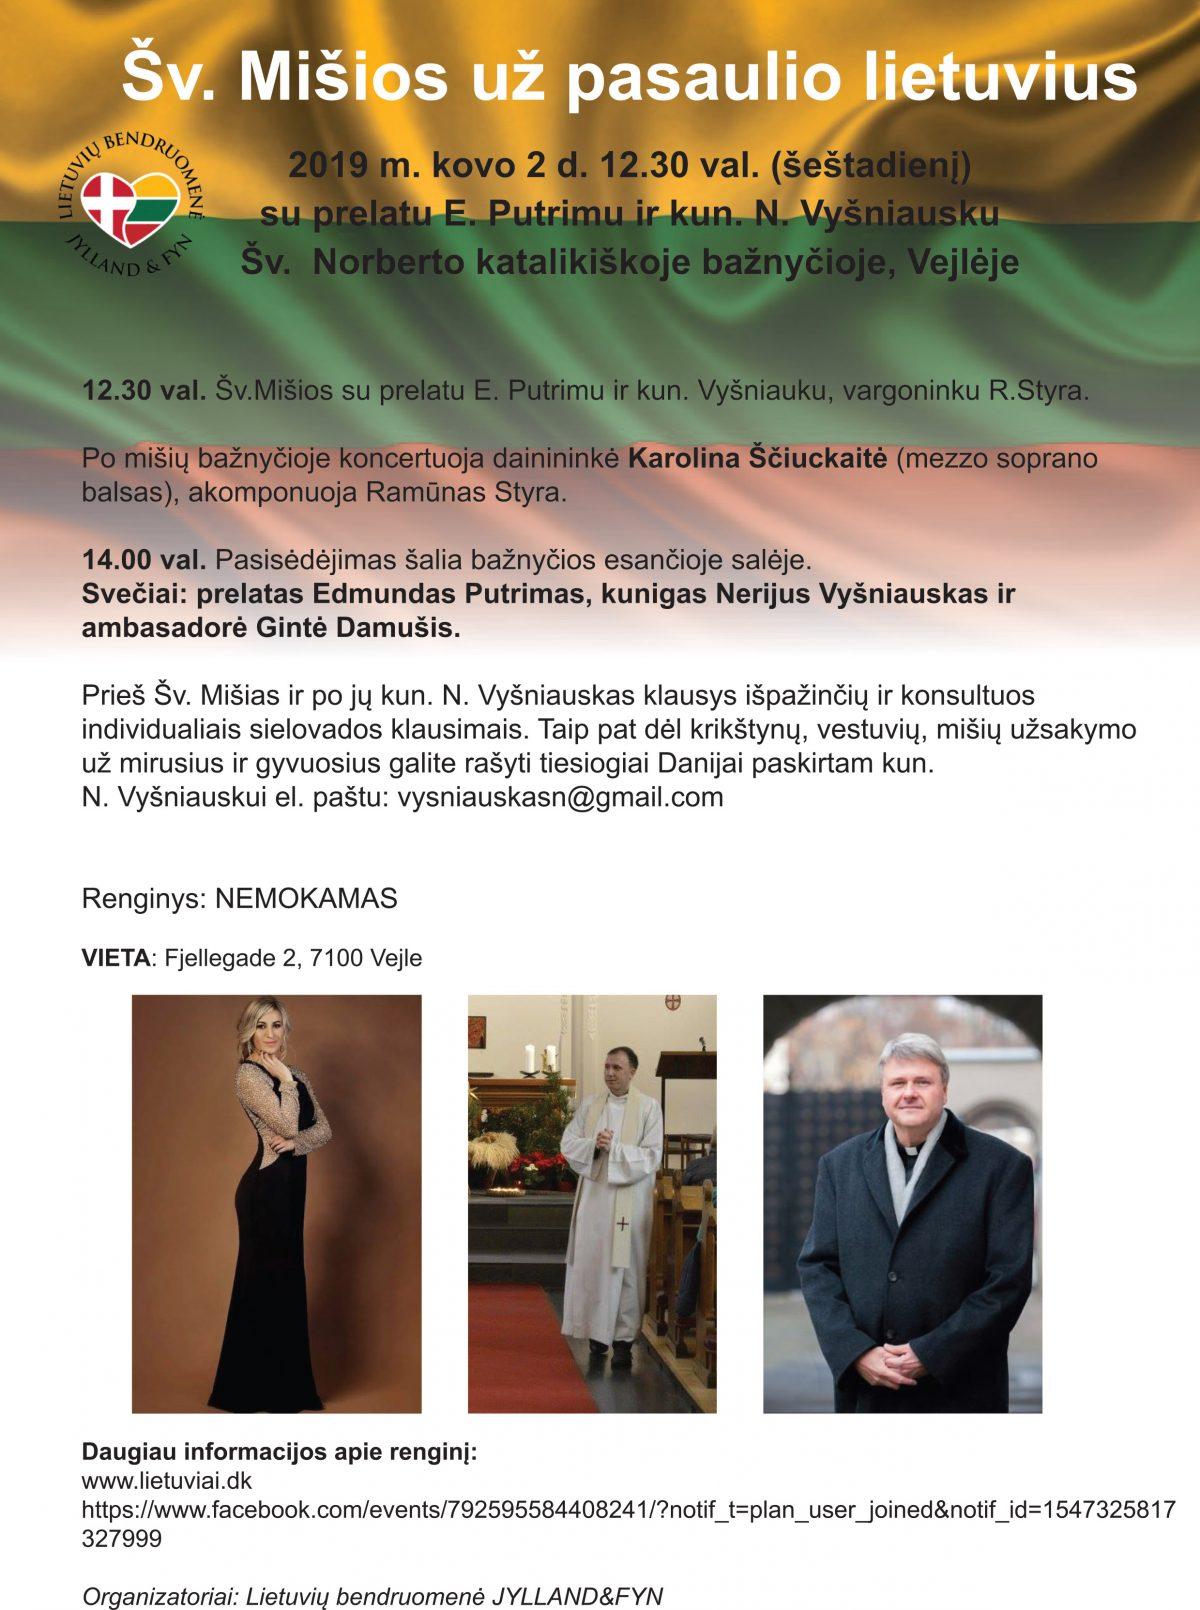 Šv. mišios su prelatu E. Putrimu ir kun. N. Vyšniausku